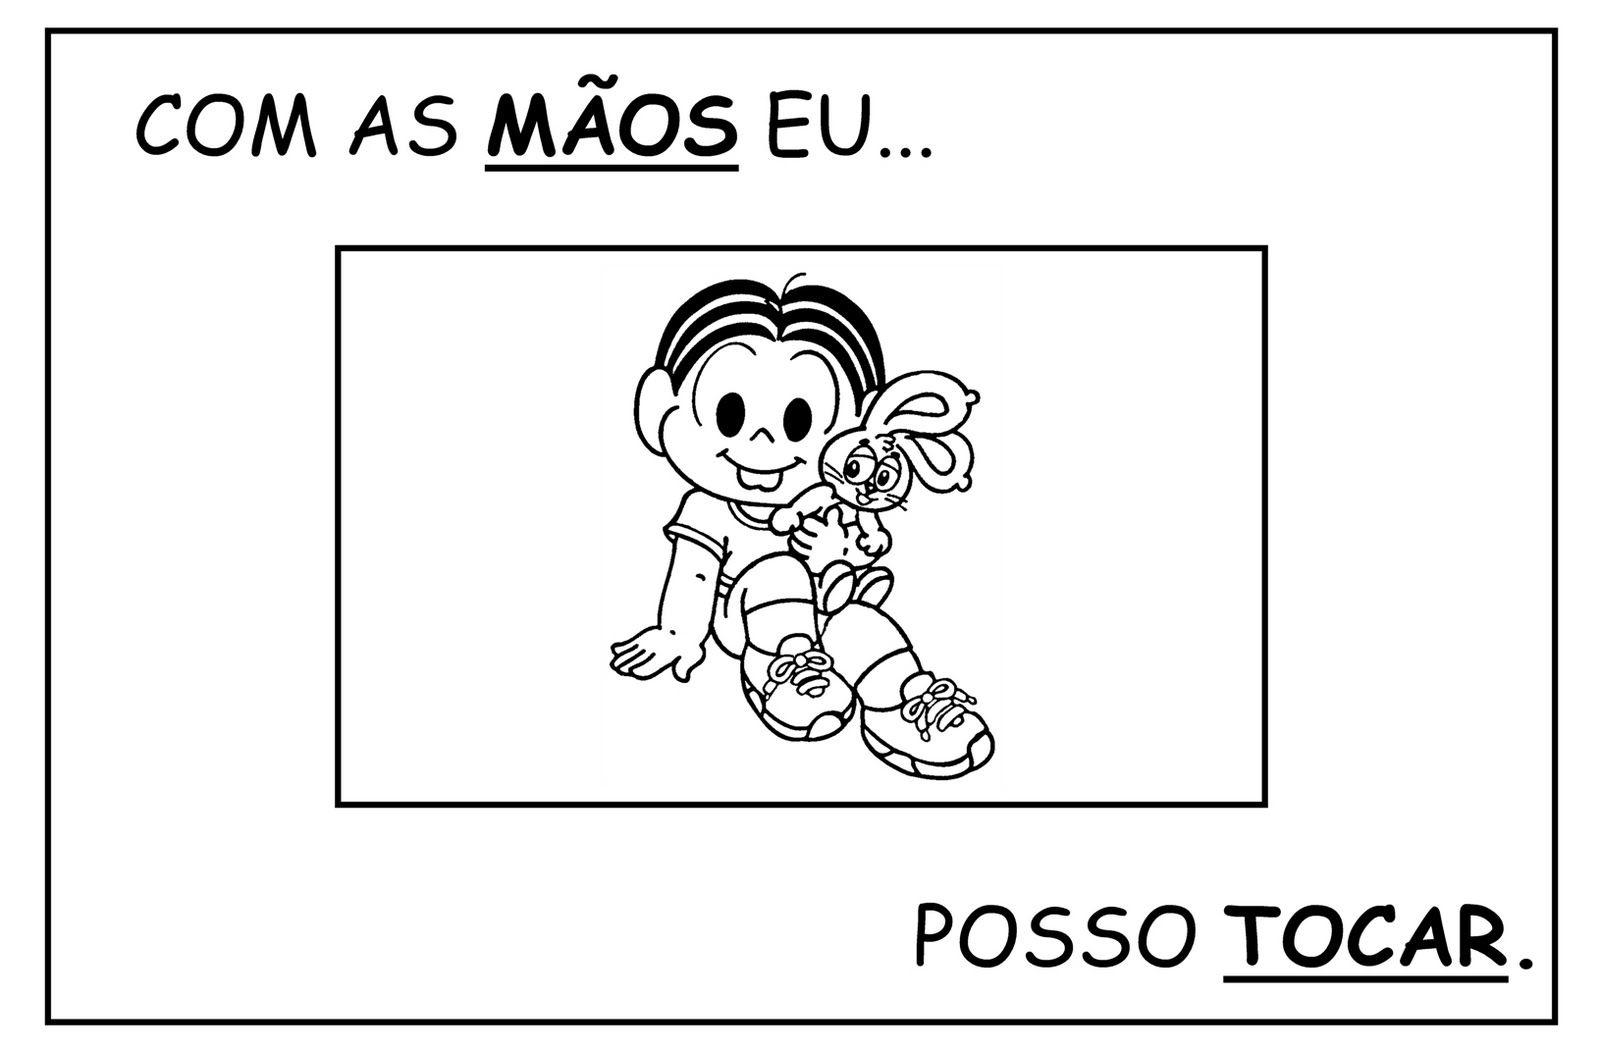 Sentidos Maos Jpg 1600 1050 Projeto Identidade Educacao